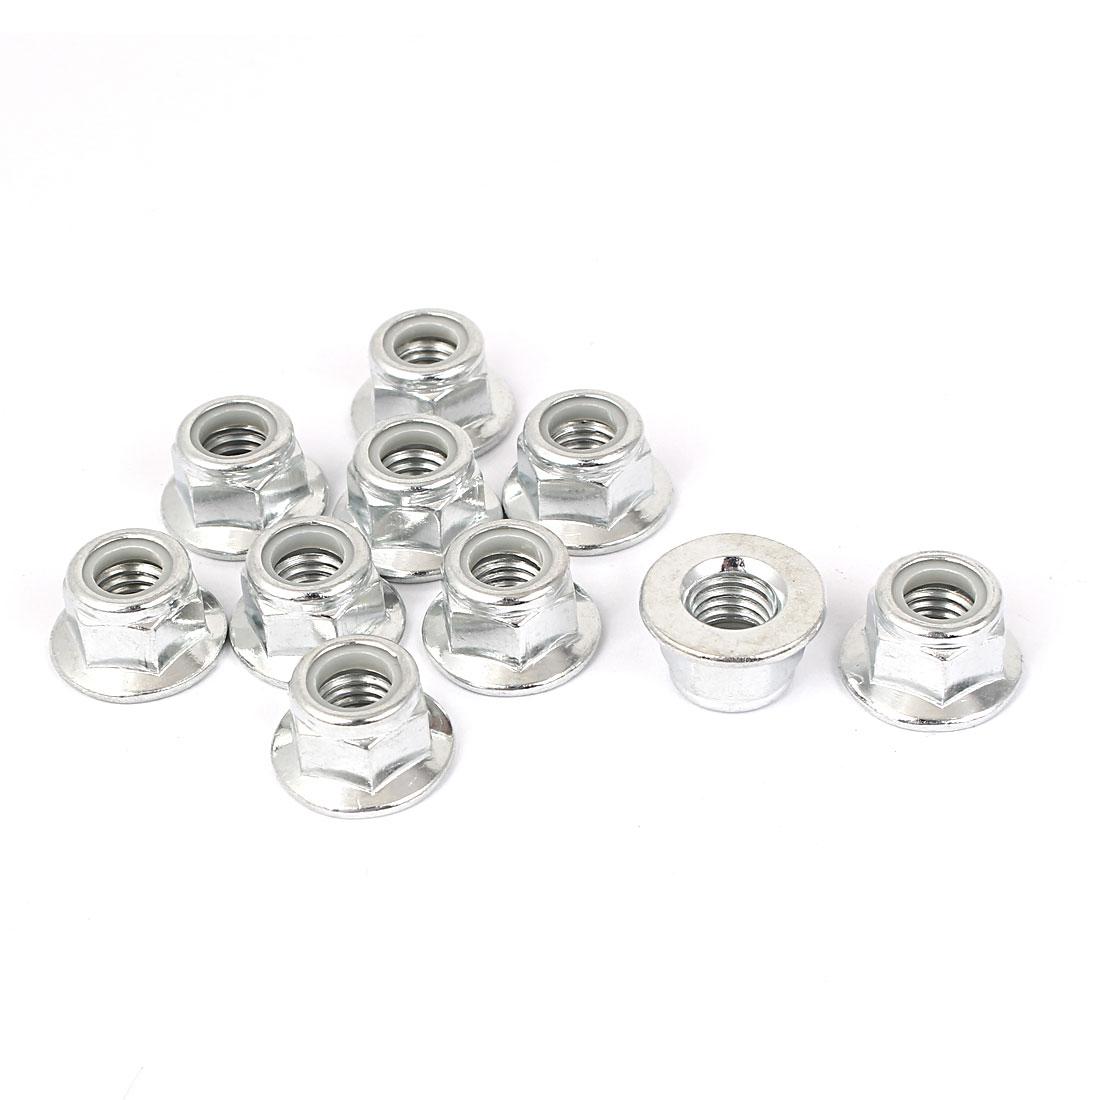 M10 Zinc Plated Hex Flange Nylon Insert Locking Lock Nuts 10pcs